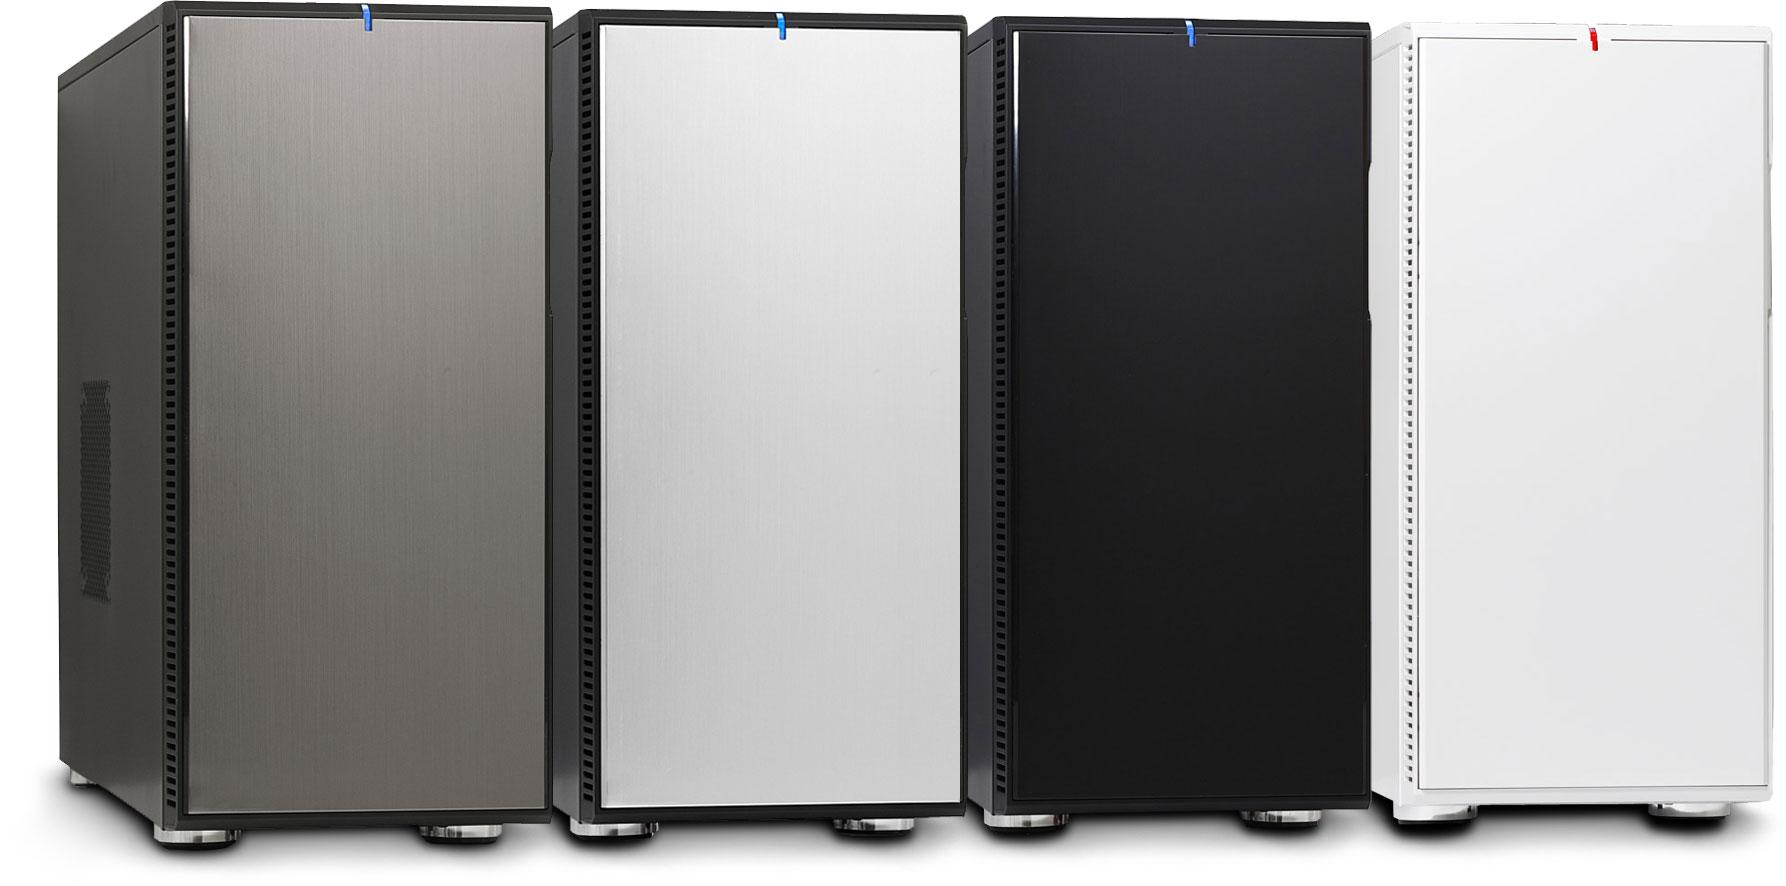 Fractal design define r3 computer cases for Define minimalist design